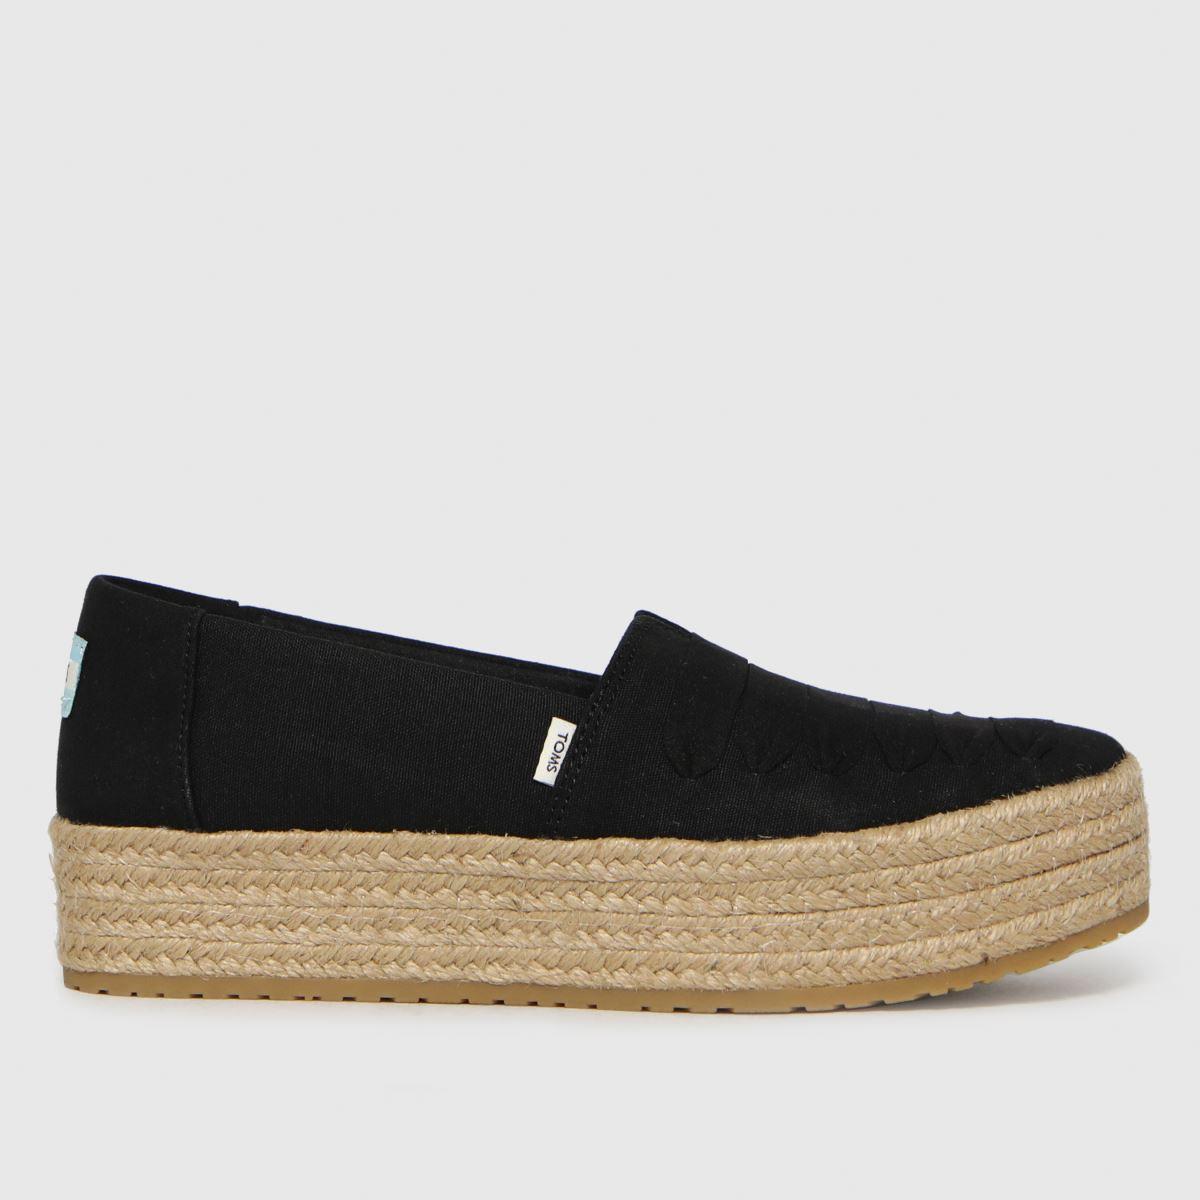 TOMS Black Valencia Vegan Flat Shoes